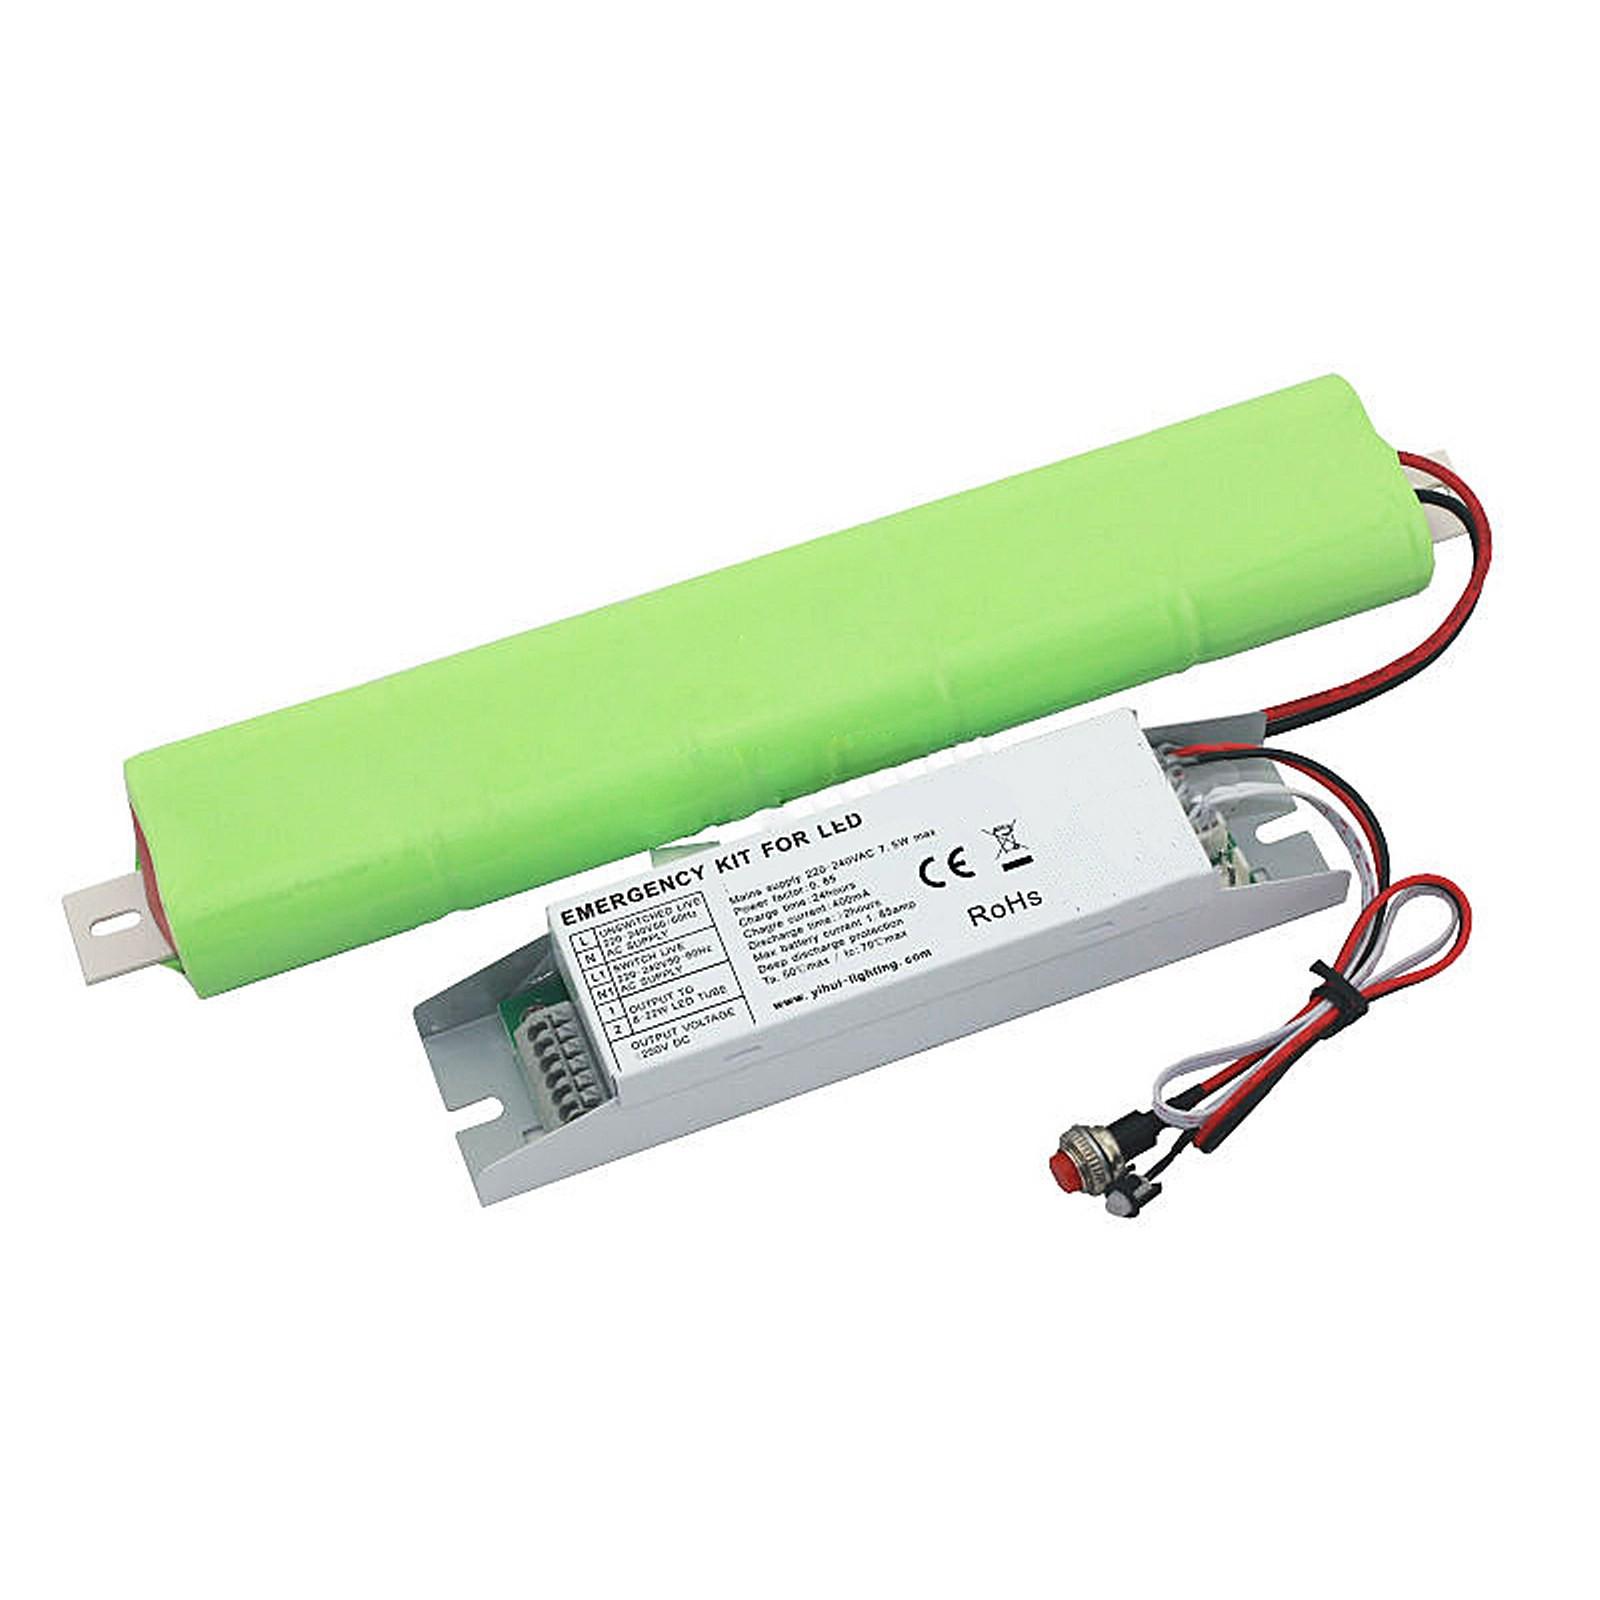 Kit di conversione batteria luci di emergenza per faretto for Lampada di emergenza a led